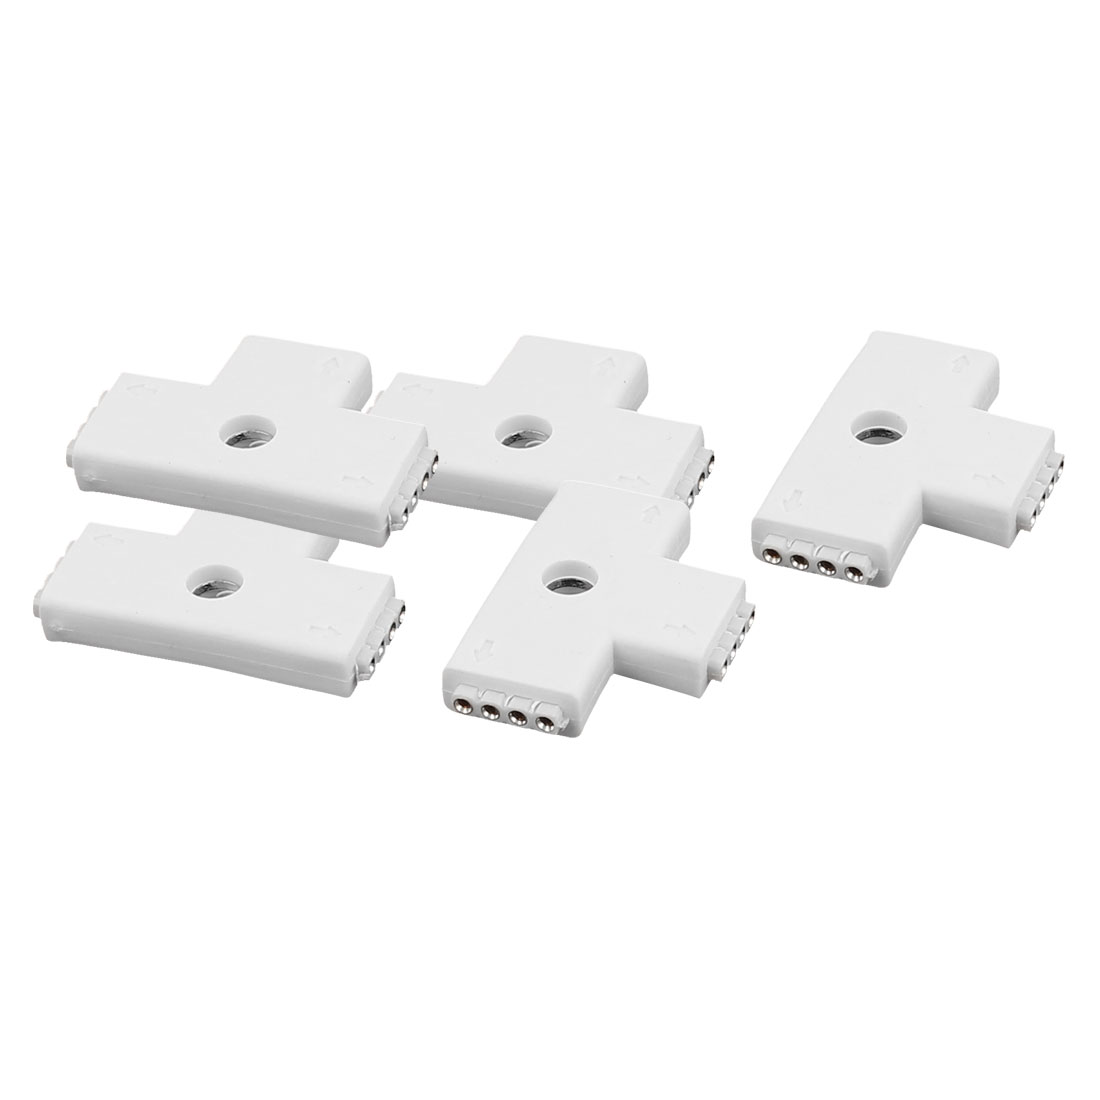 5 Pcs T Shape 3 Way 4P Female Connector White for 5050 RGBW PCB Led Strip Light